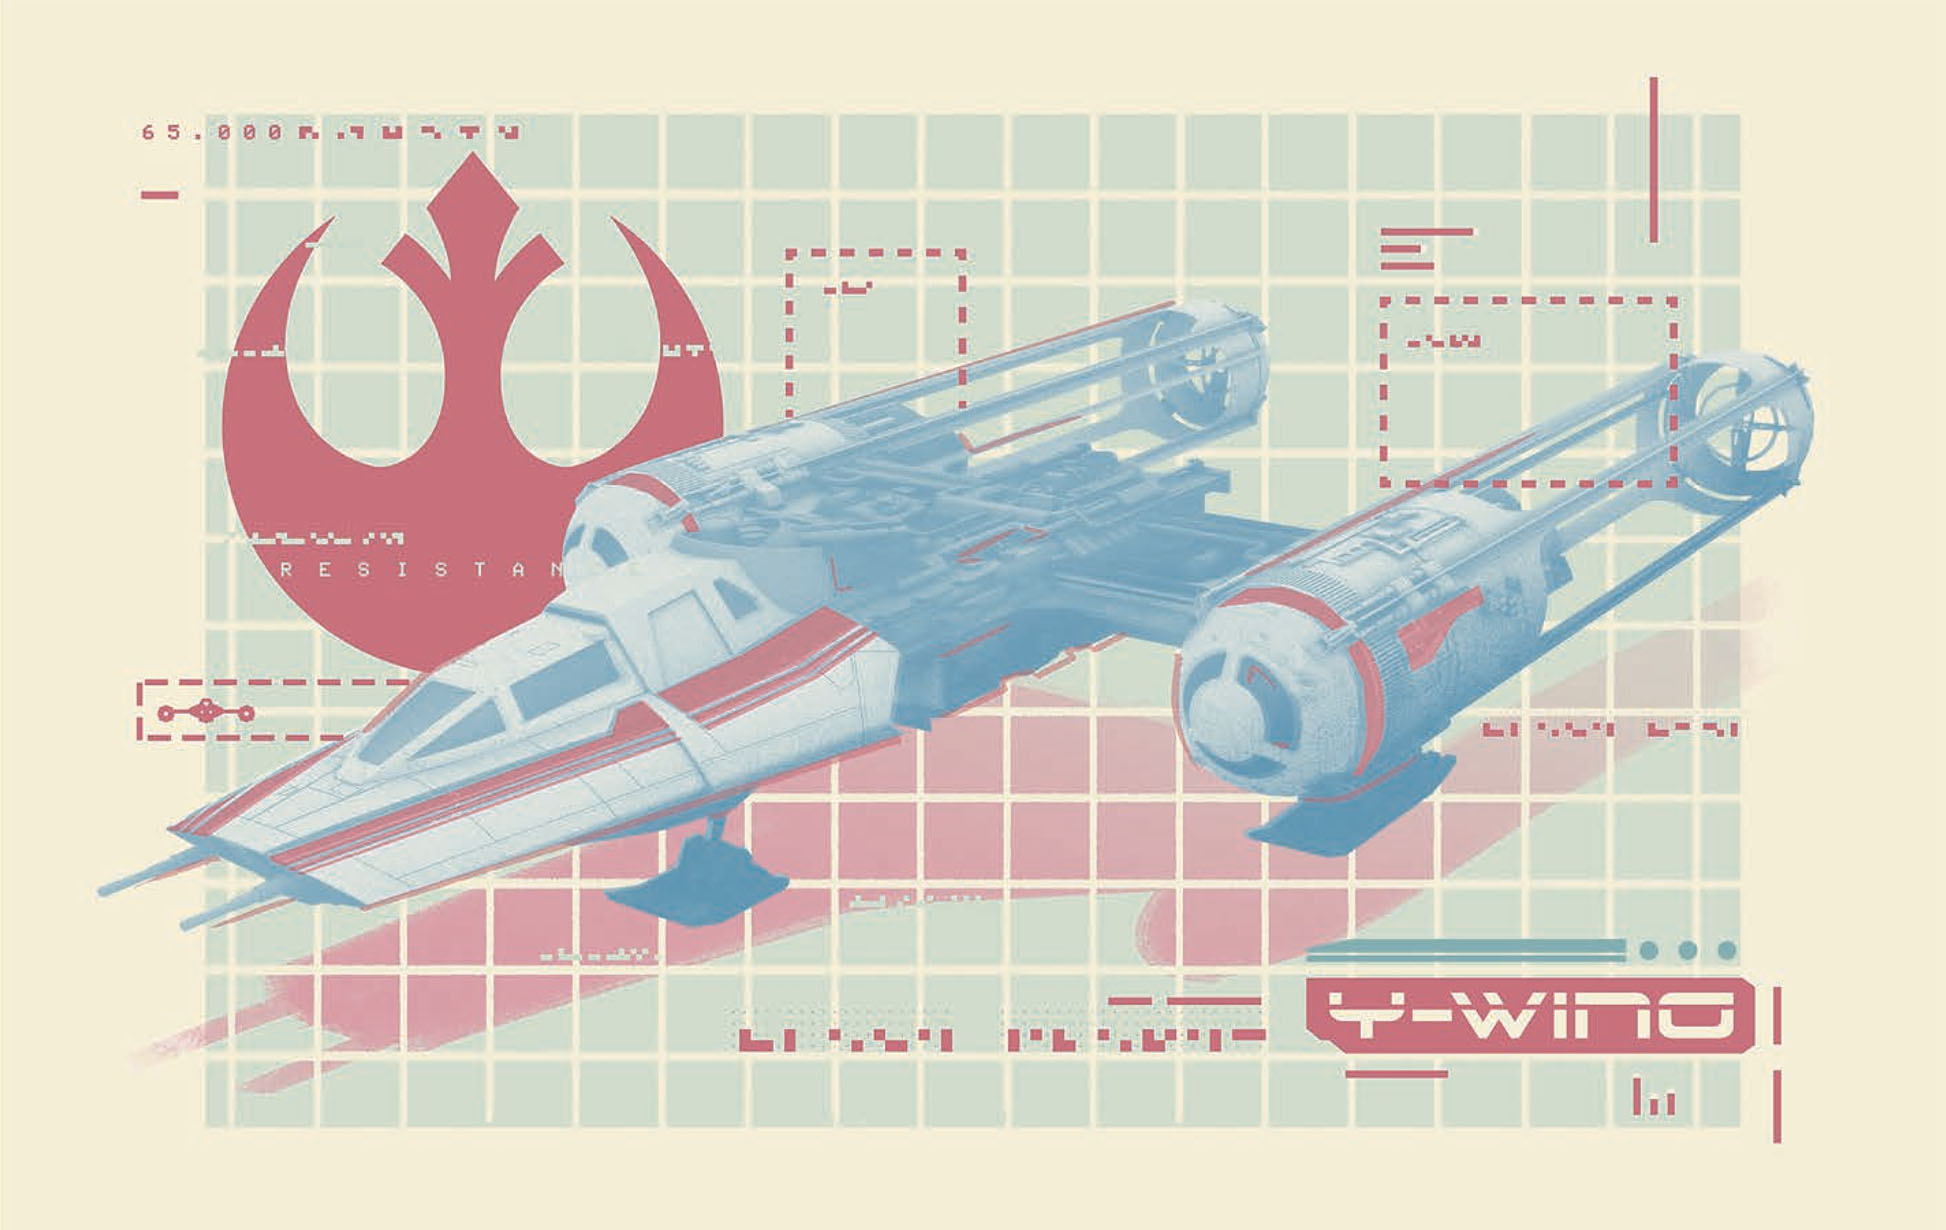 Star Wars The Rise Of Skywalker Official Style Guide Promotional Artwork Blueprints 12 Geek Carl